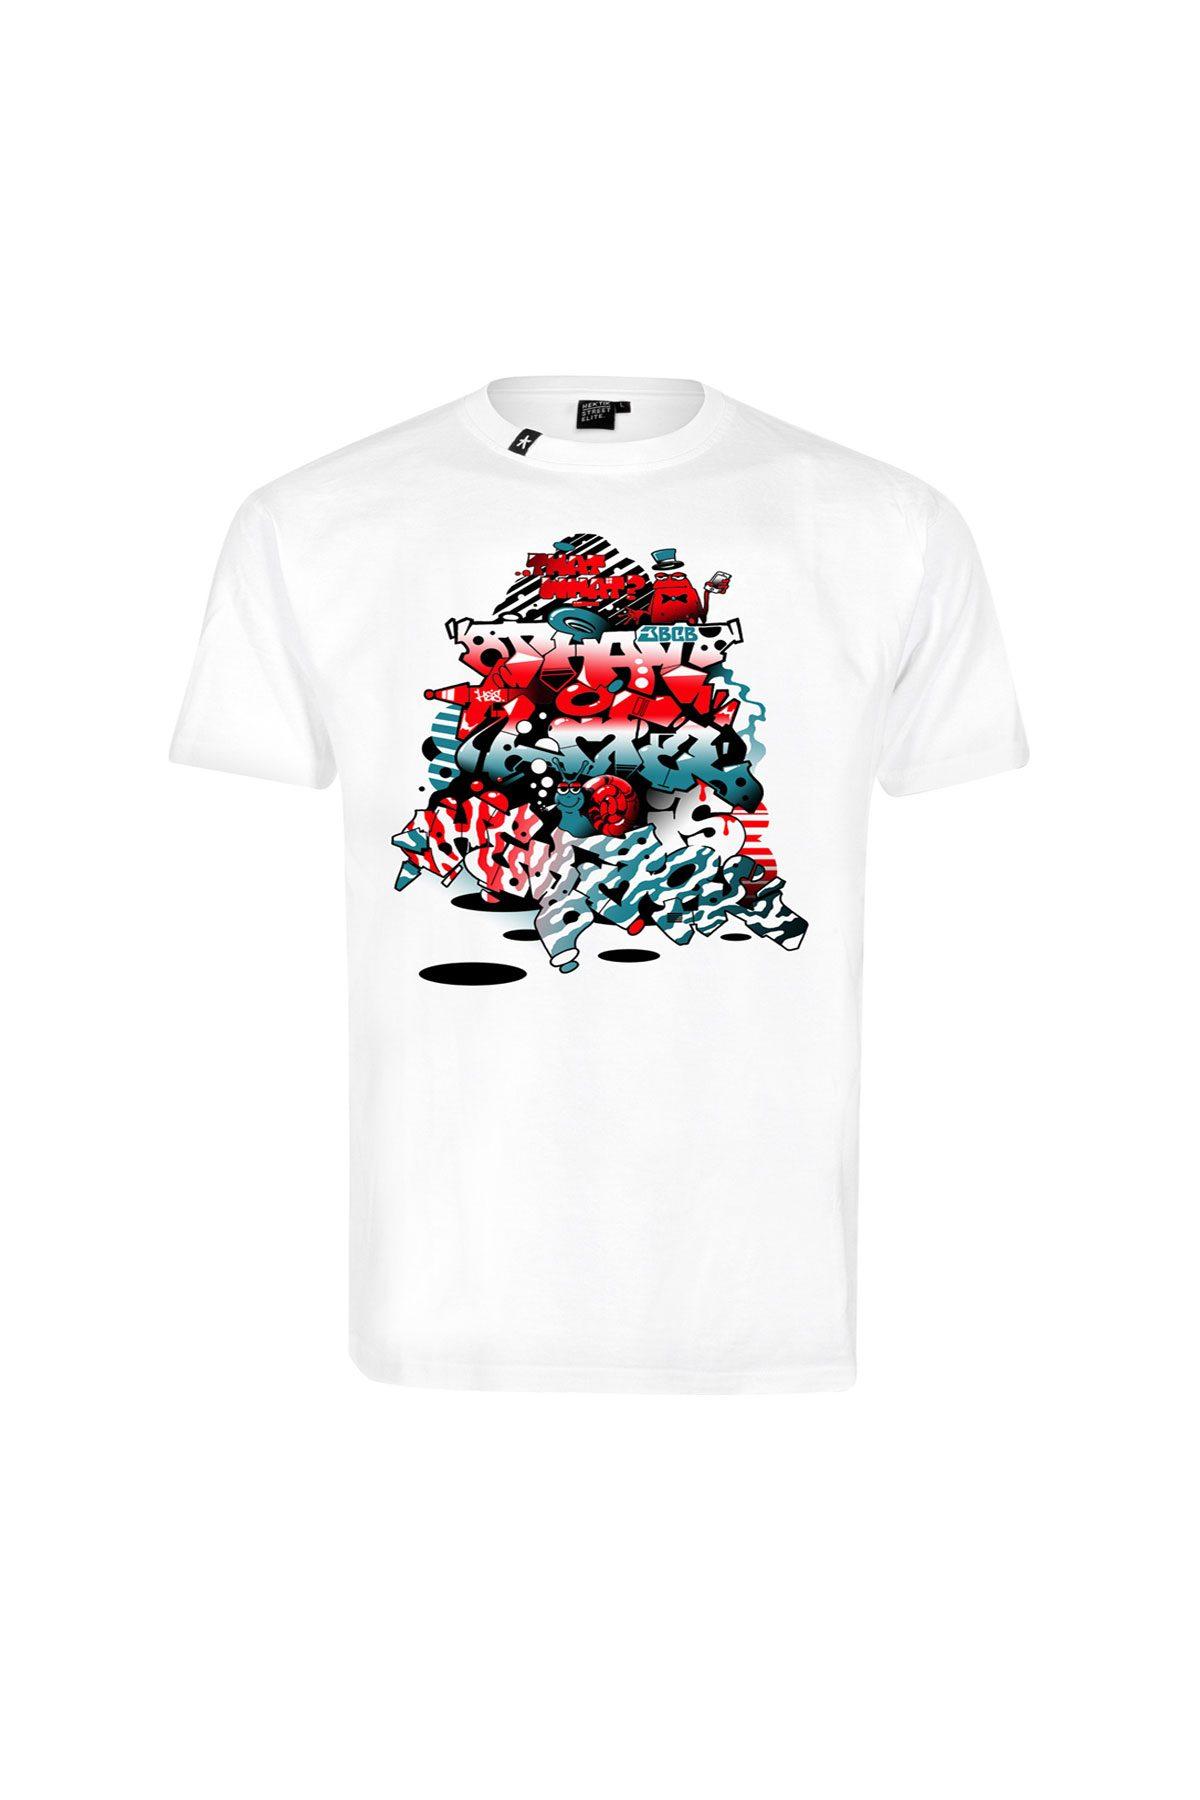 Hektik by HEIS T-Shirt